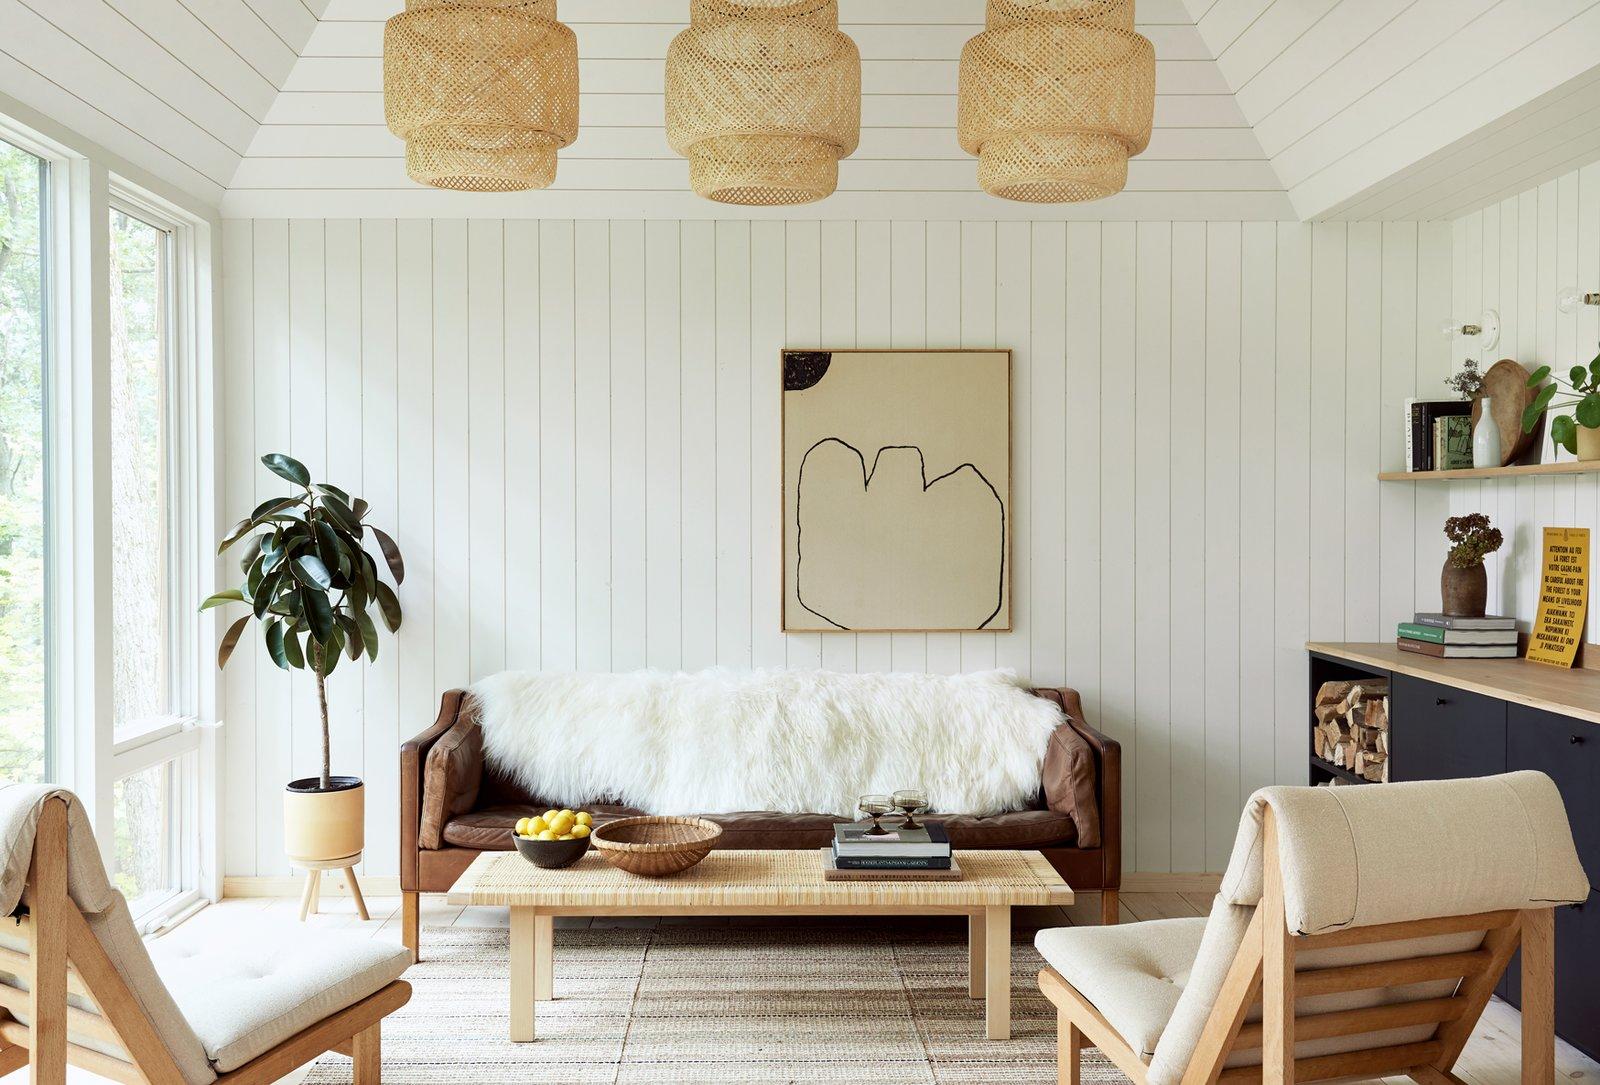 The Hut living room